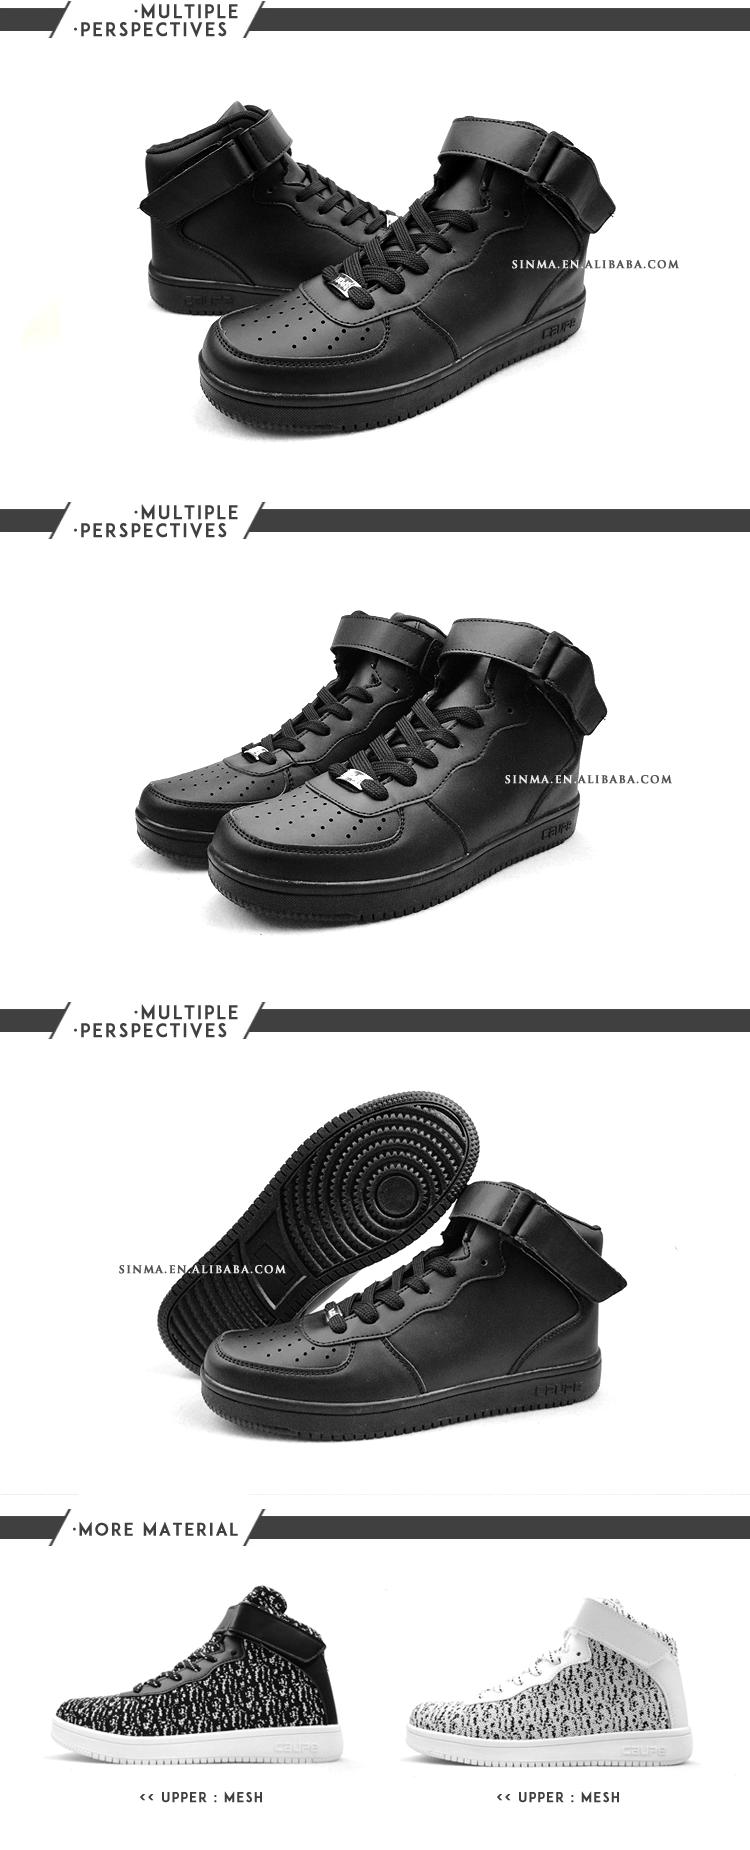 wholesale fashion no name brand shoes cheap men sport. Black Bedroom Furniture Sets. Home Design Ideas